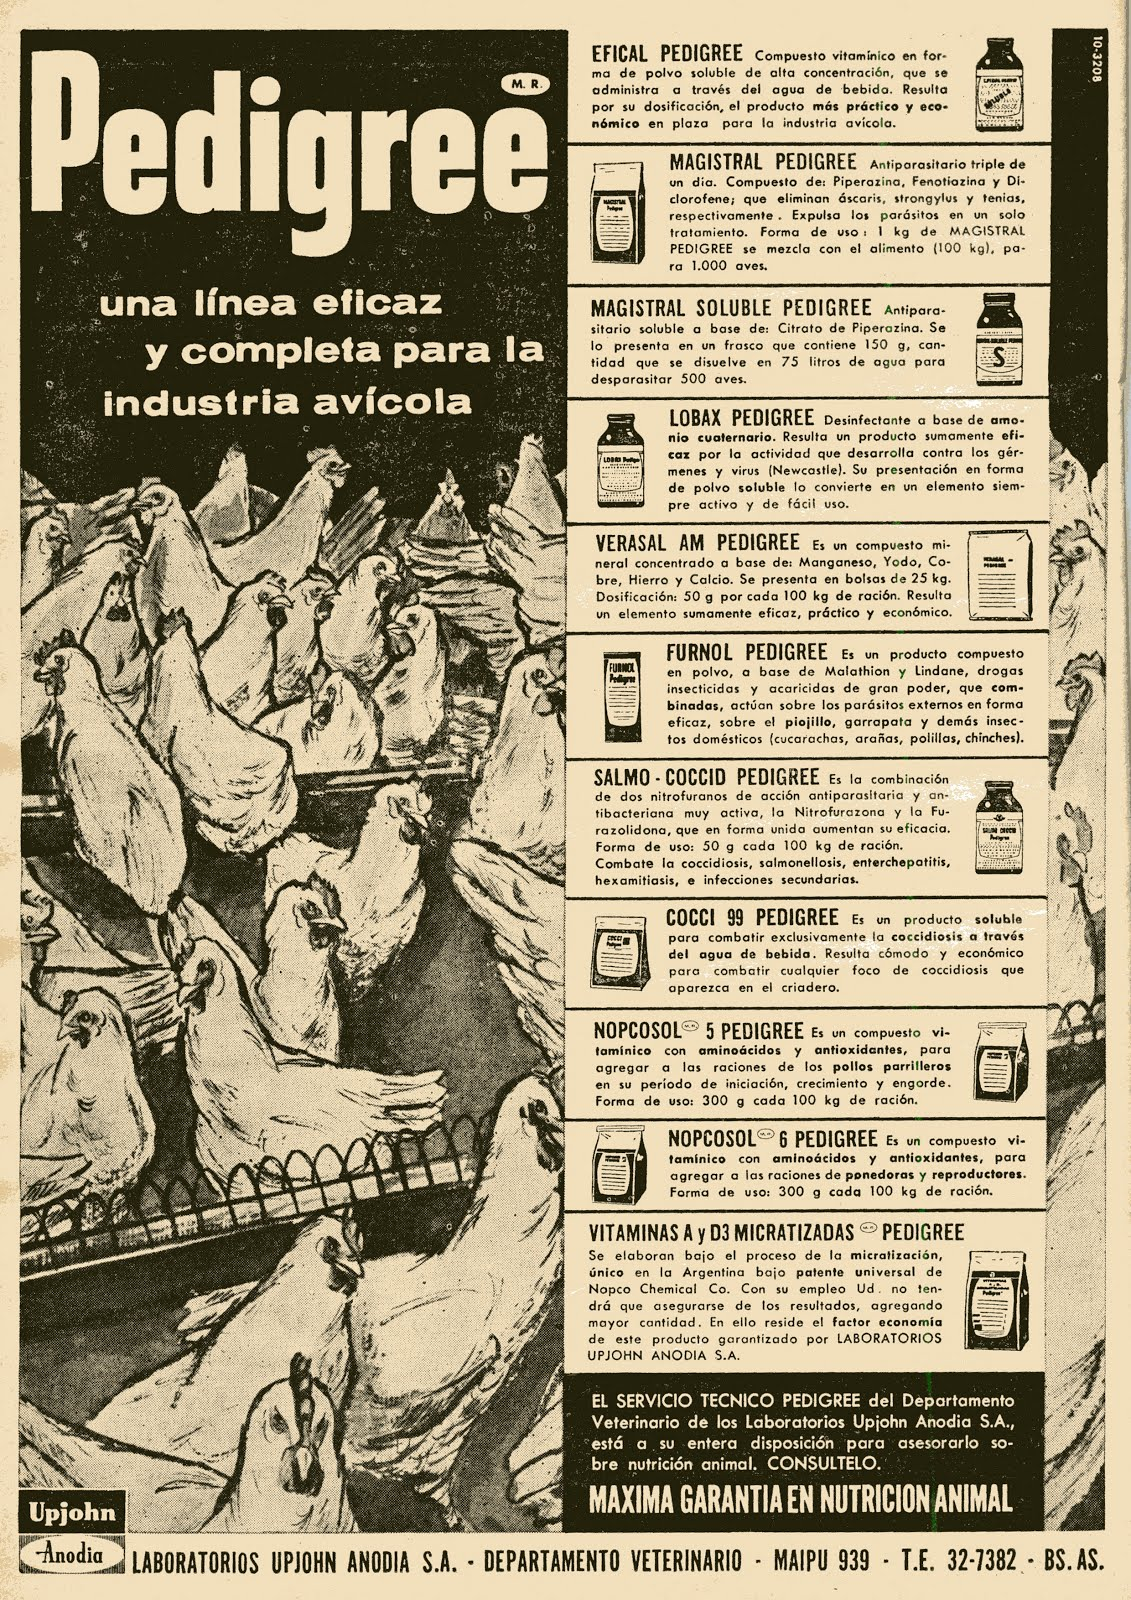 #tbt 1964